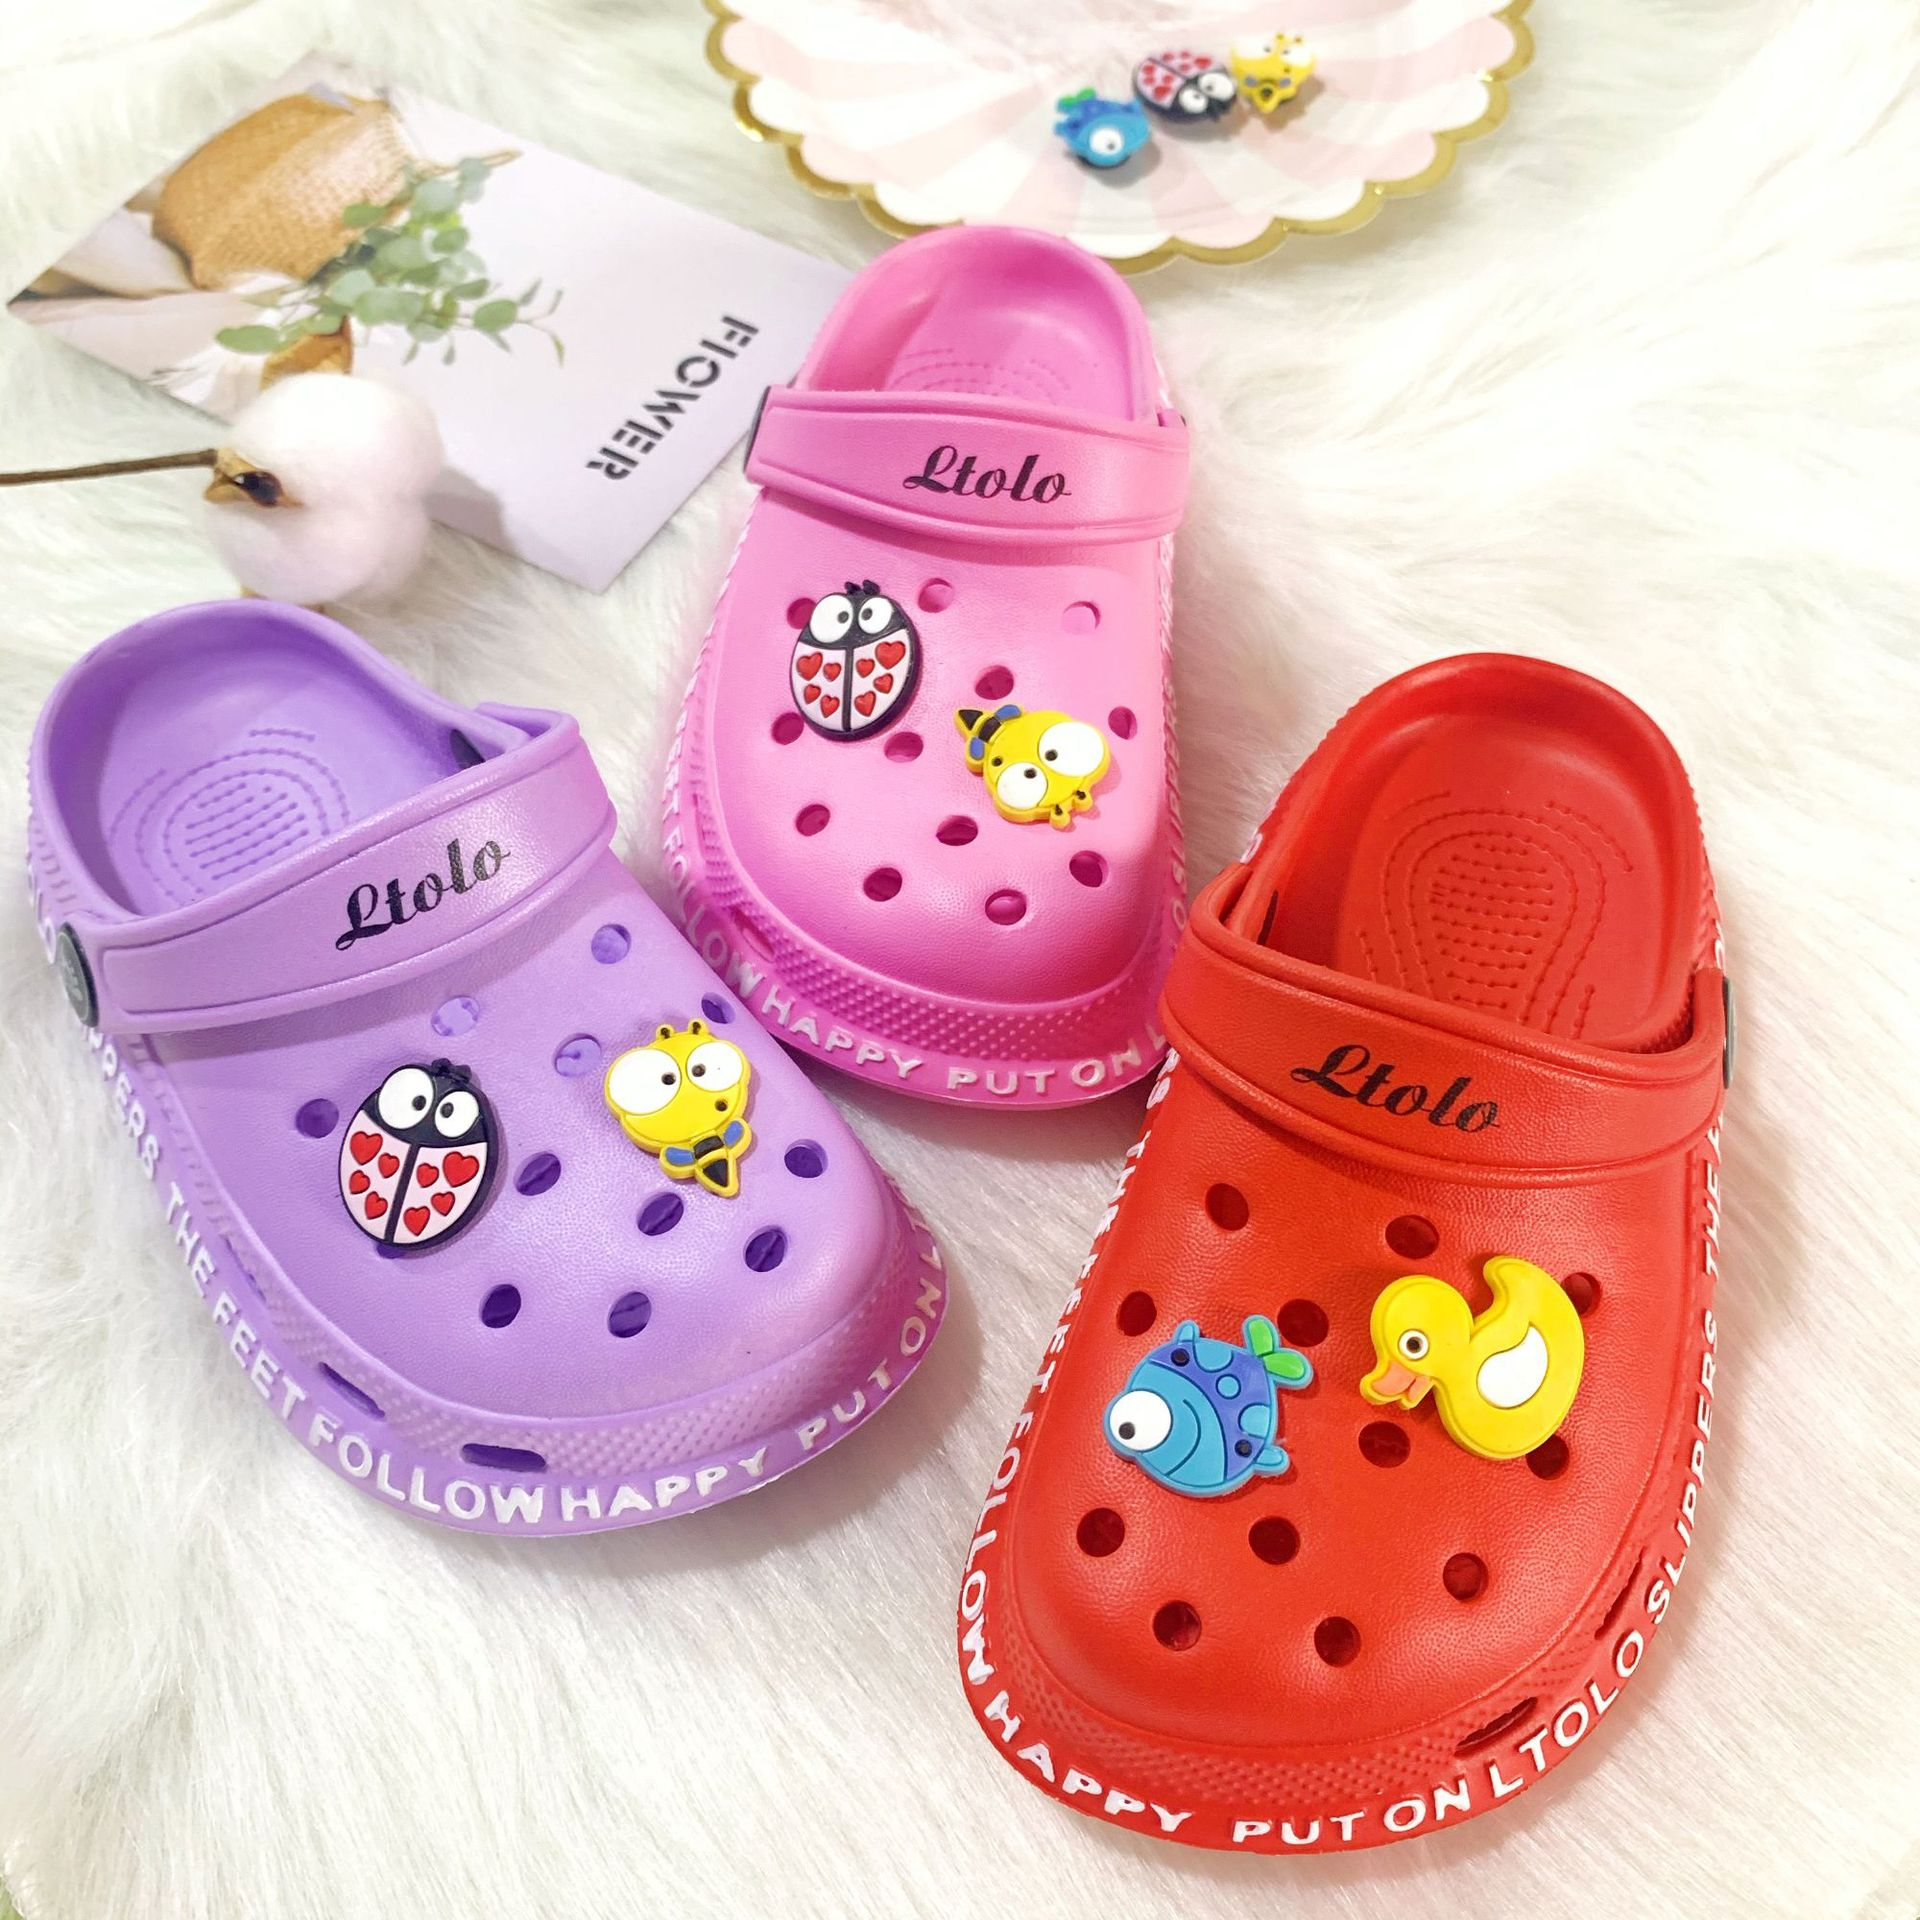 Ltolo Children Kids Girl Mules Clogs Summer Crock Garden Beach Slippers Sandals Cave Hole Baby Shoes For Girls EUR23-34